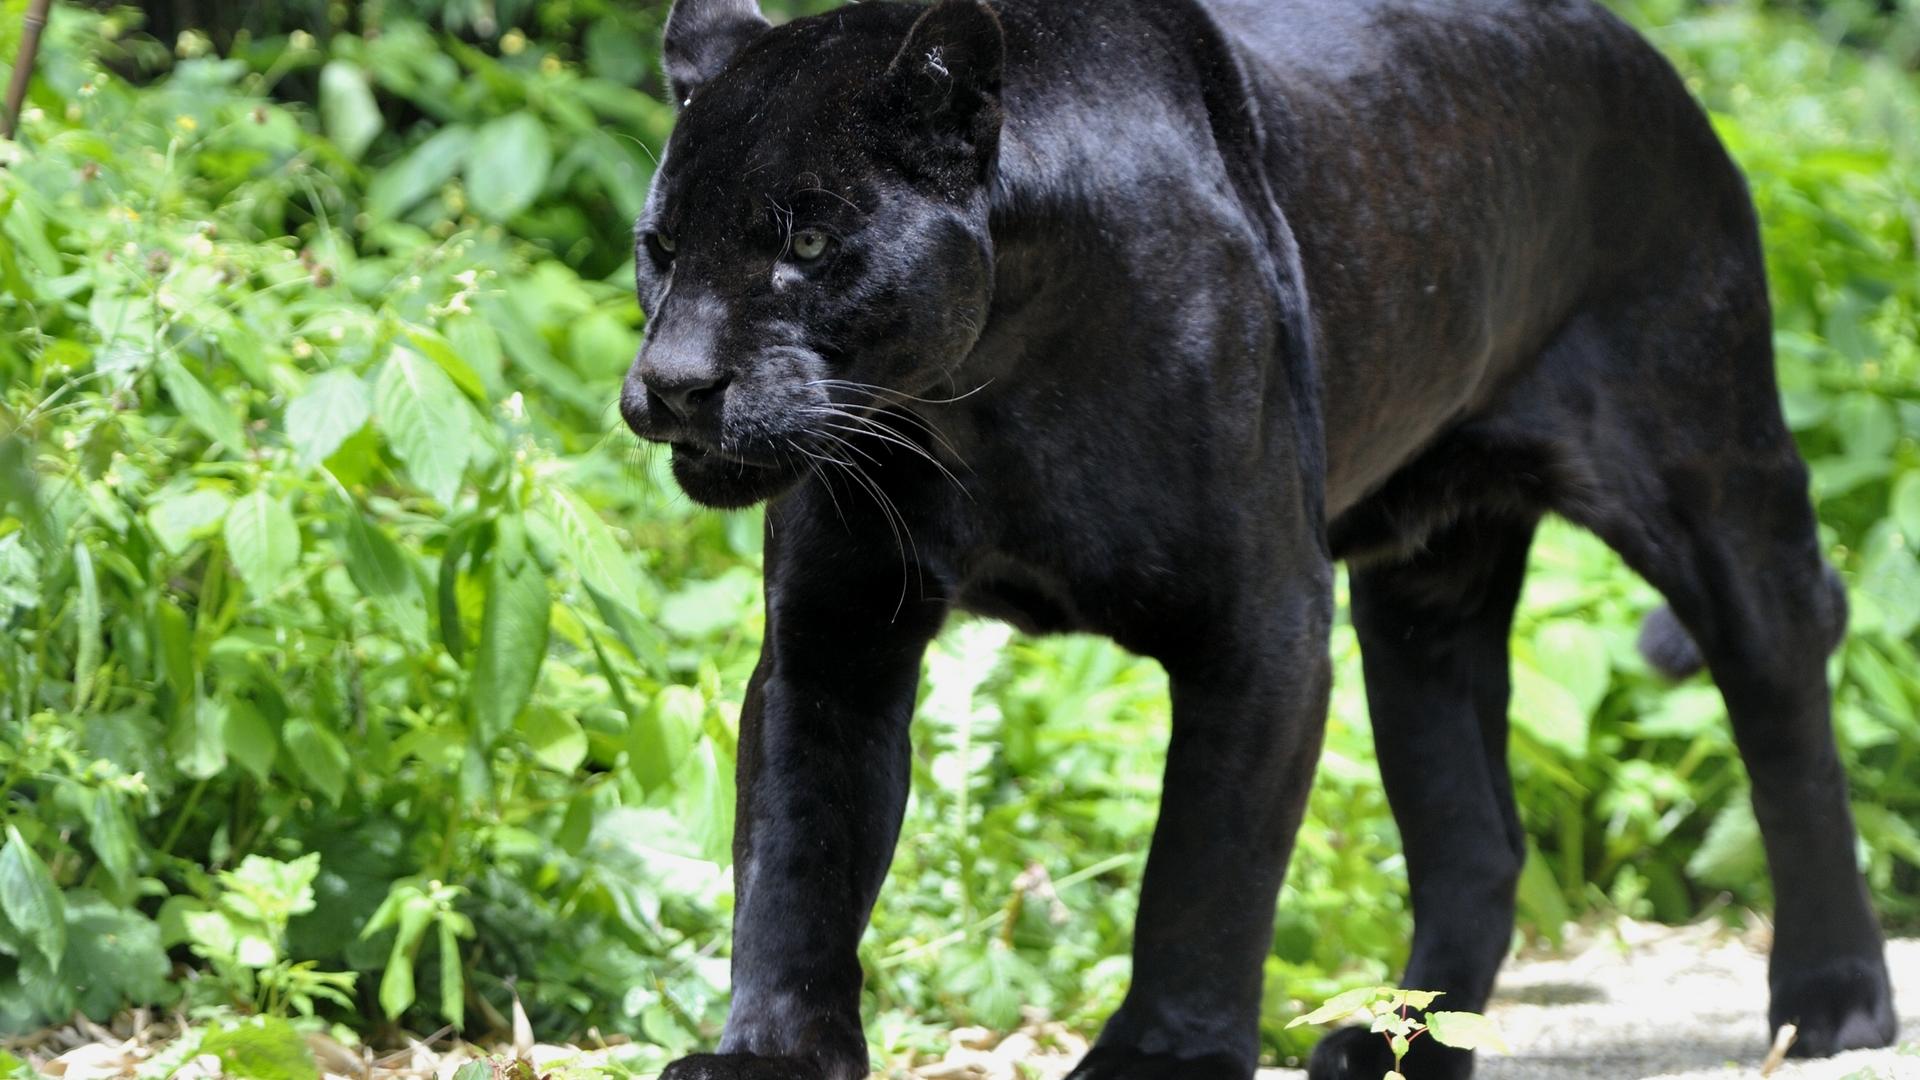 Black Panther Wallpaper 752800 Black Panther Wallpaper 752780 Black 1920x1080